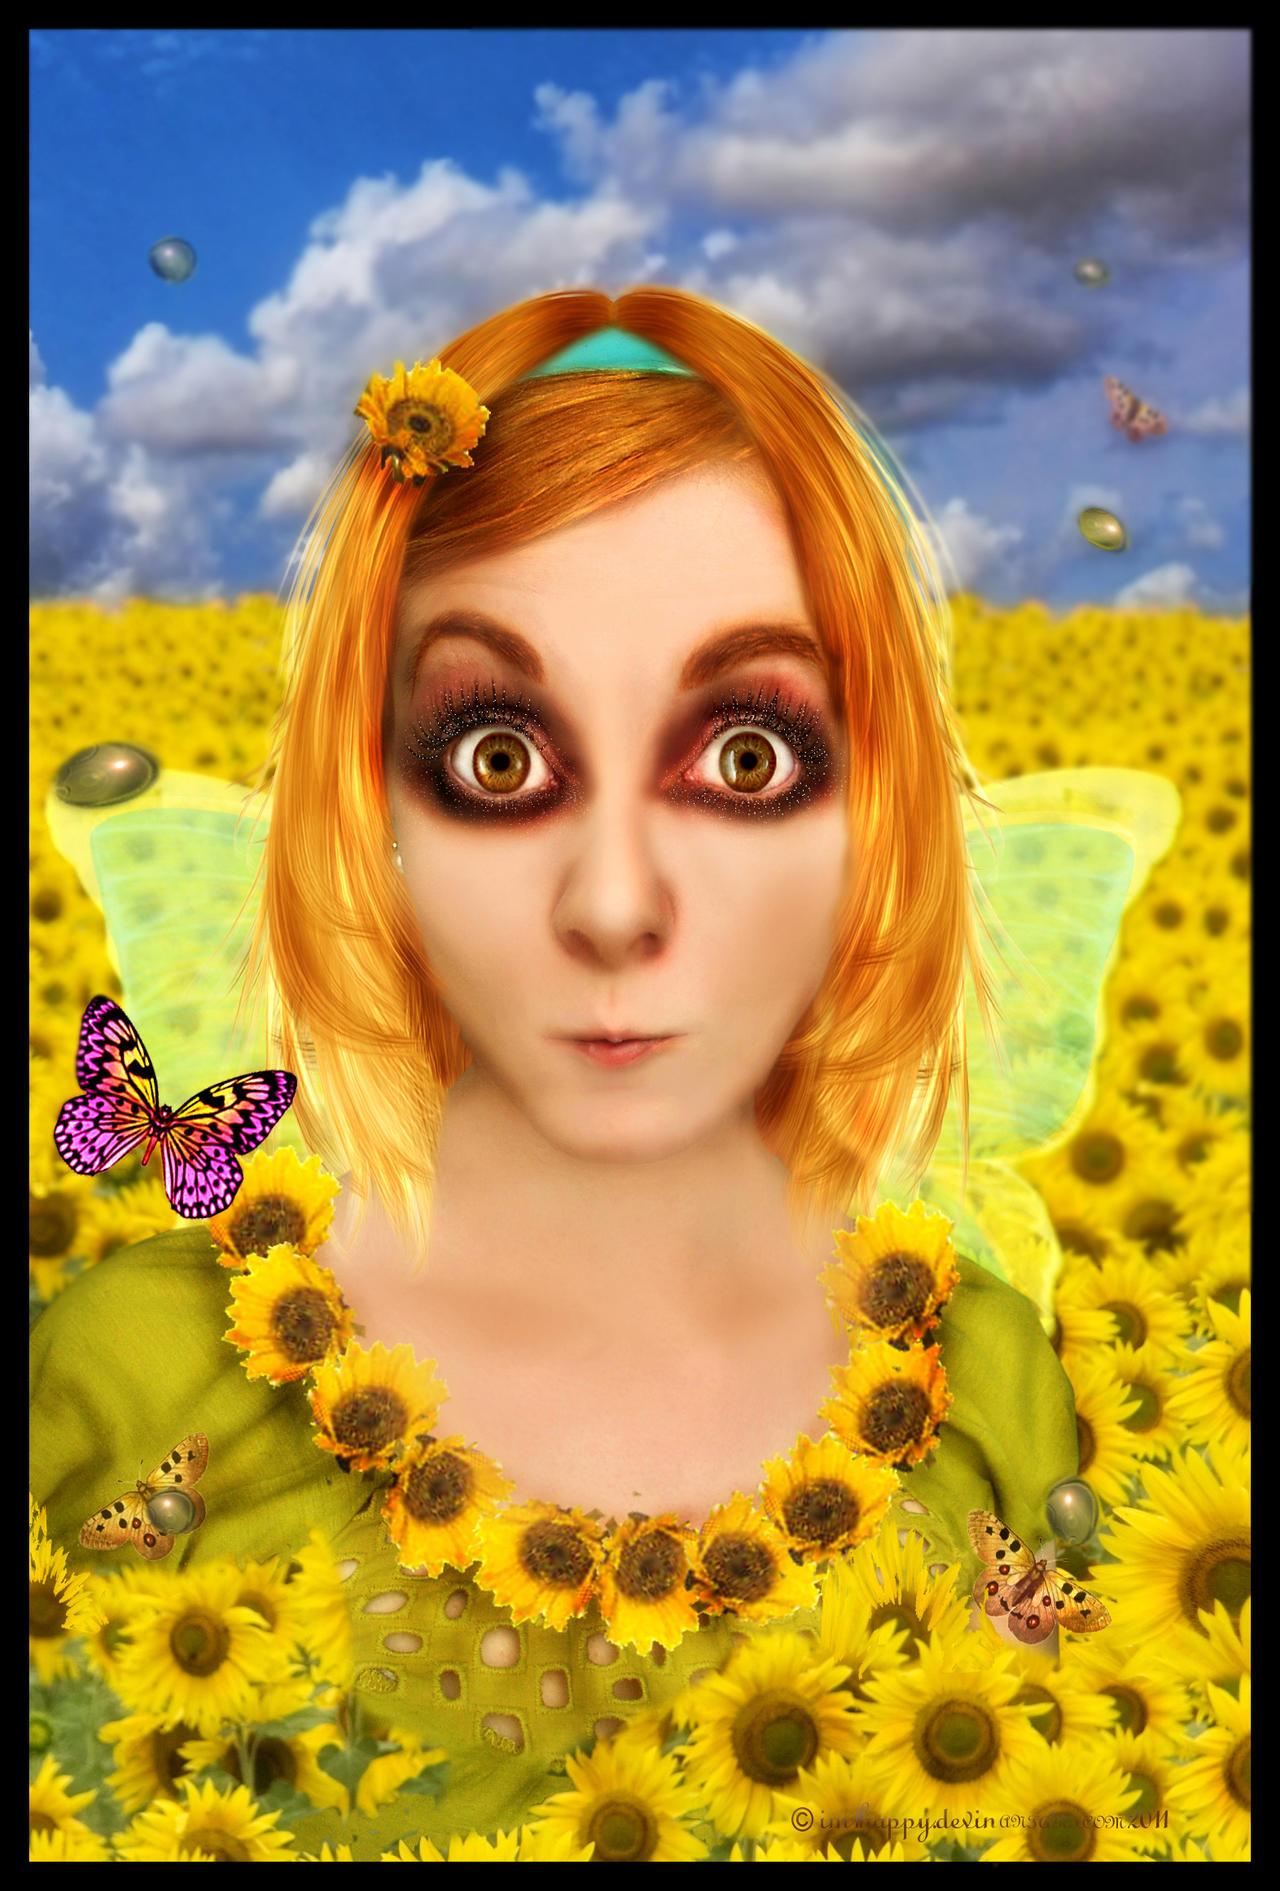 http://fc03.deviantart.net/fs71/i/2011/022/9/8/ohh_ohh_i_didnt_do_it_by_im1happy-d37r7wi.jpg